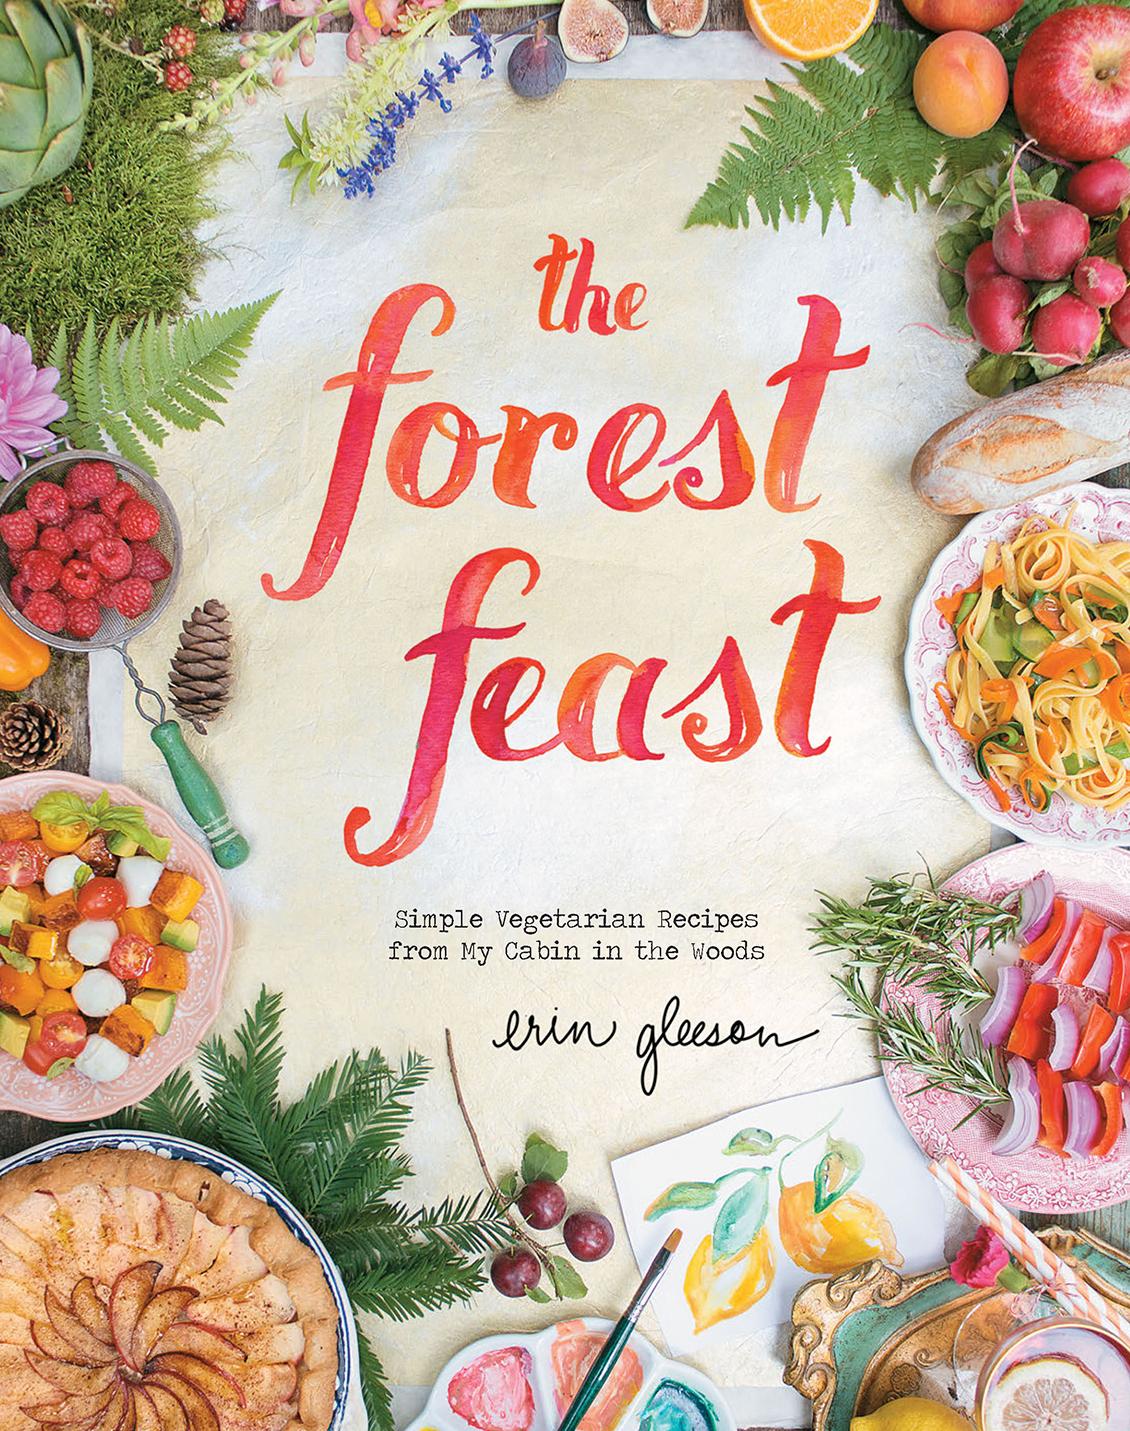 Abrams - Forest Feast - 9781613126035.jpg